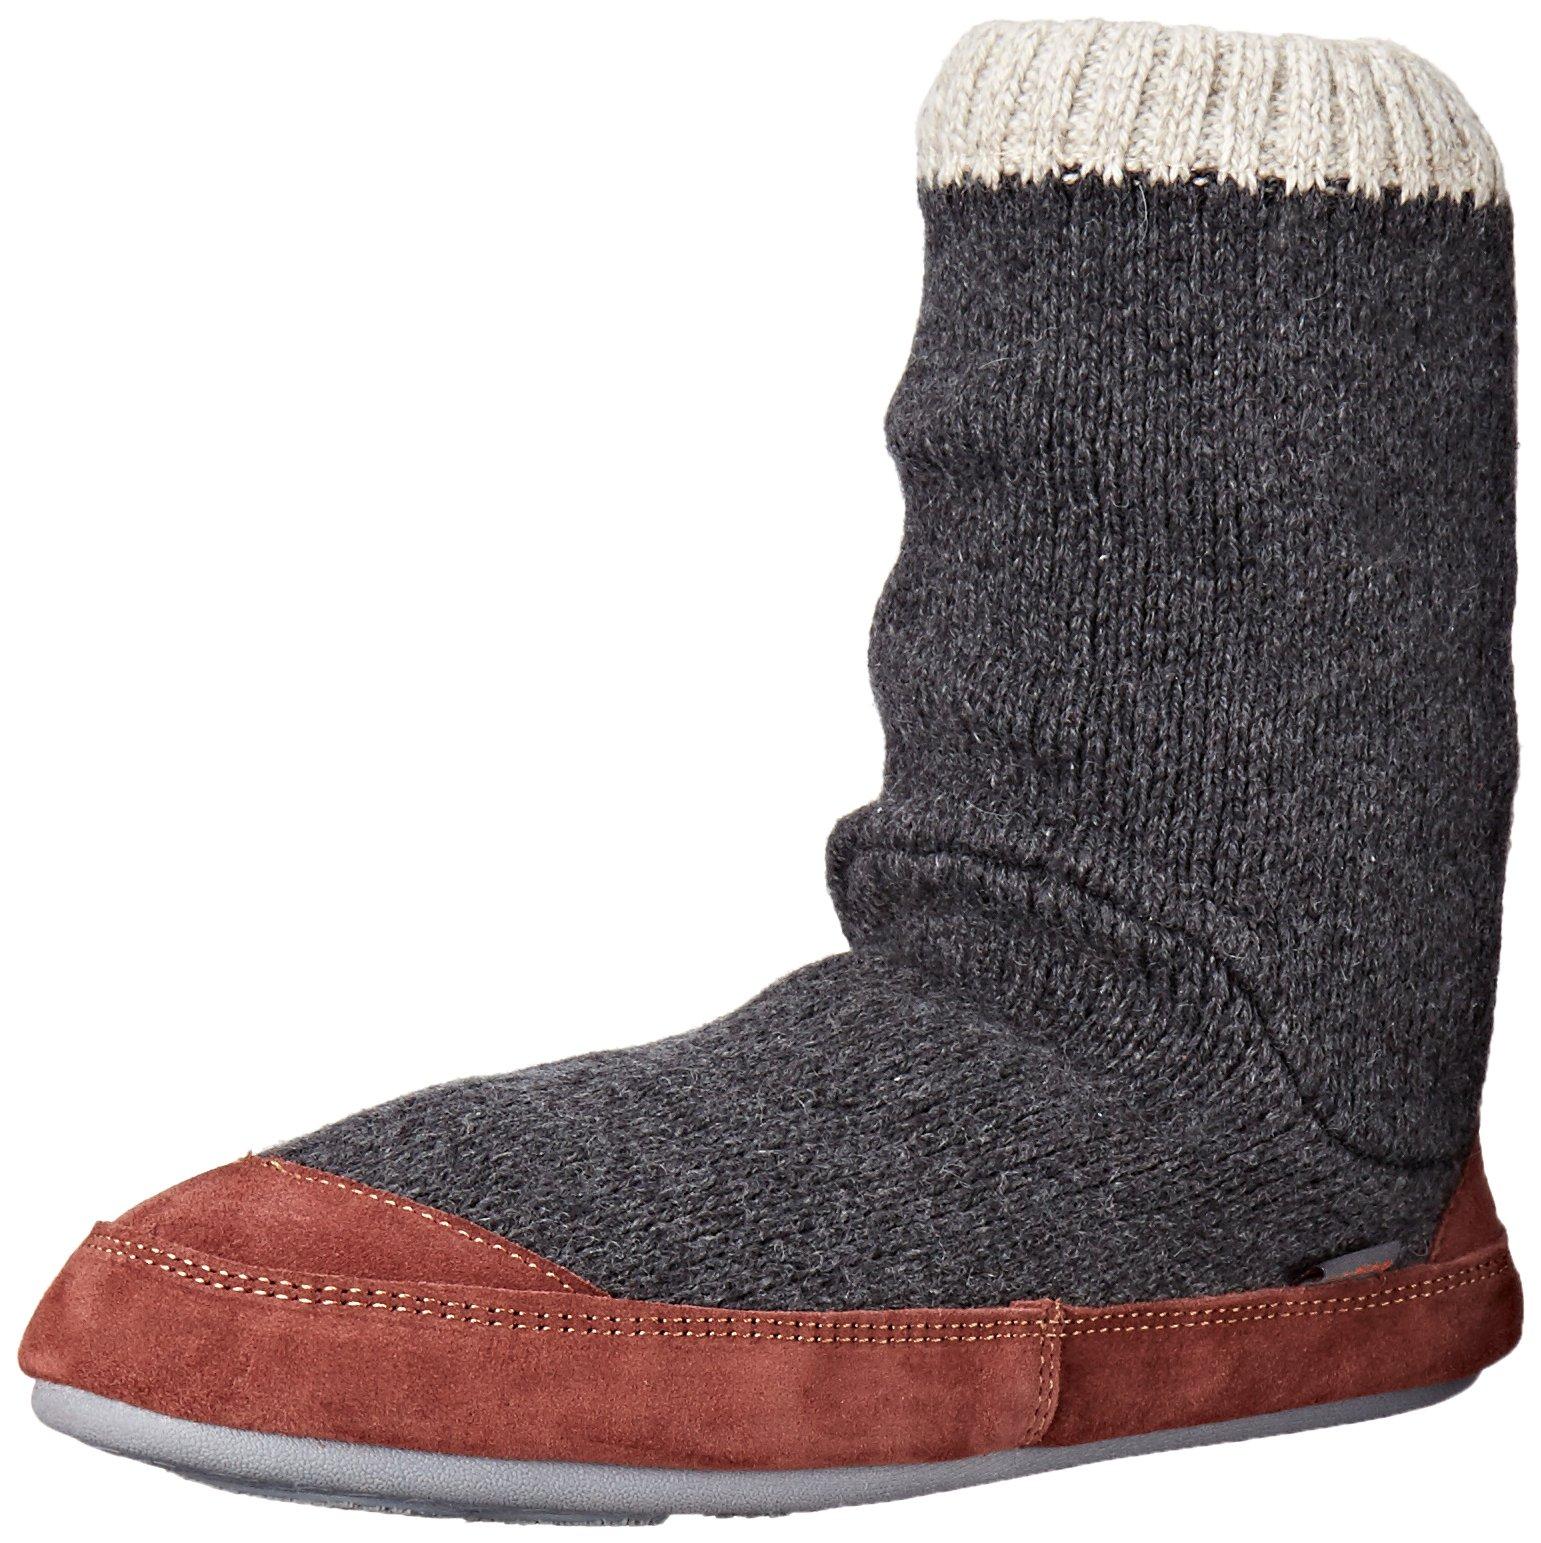 Acorn Men's Slouch Boot Slipper, Charcoal Ragg Wool, Medium/9-10 B US by Acorn (Image #1)